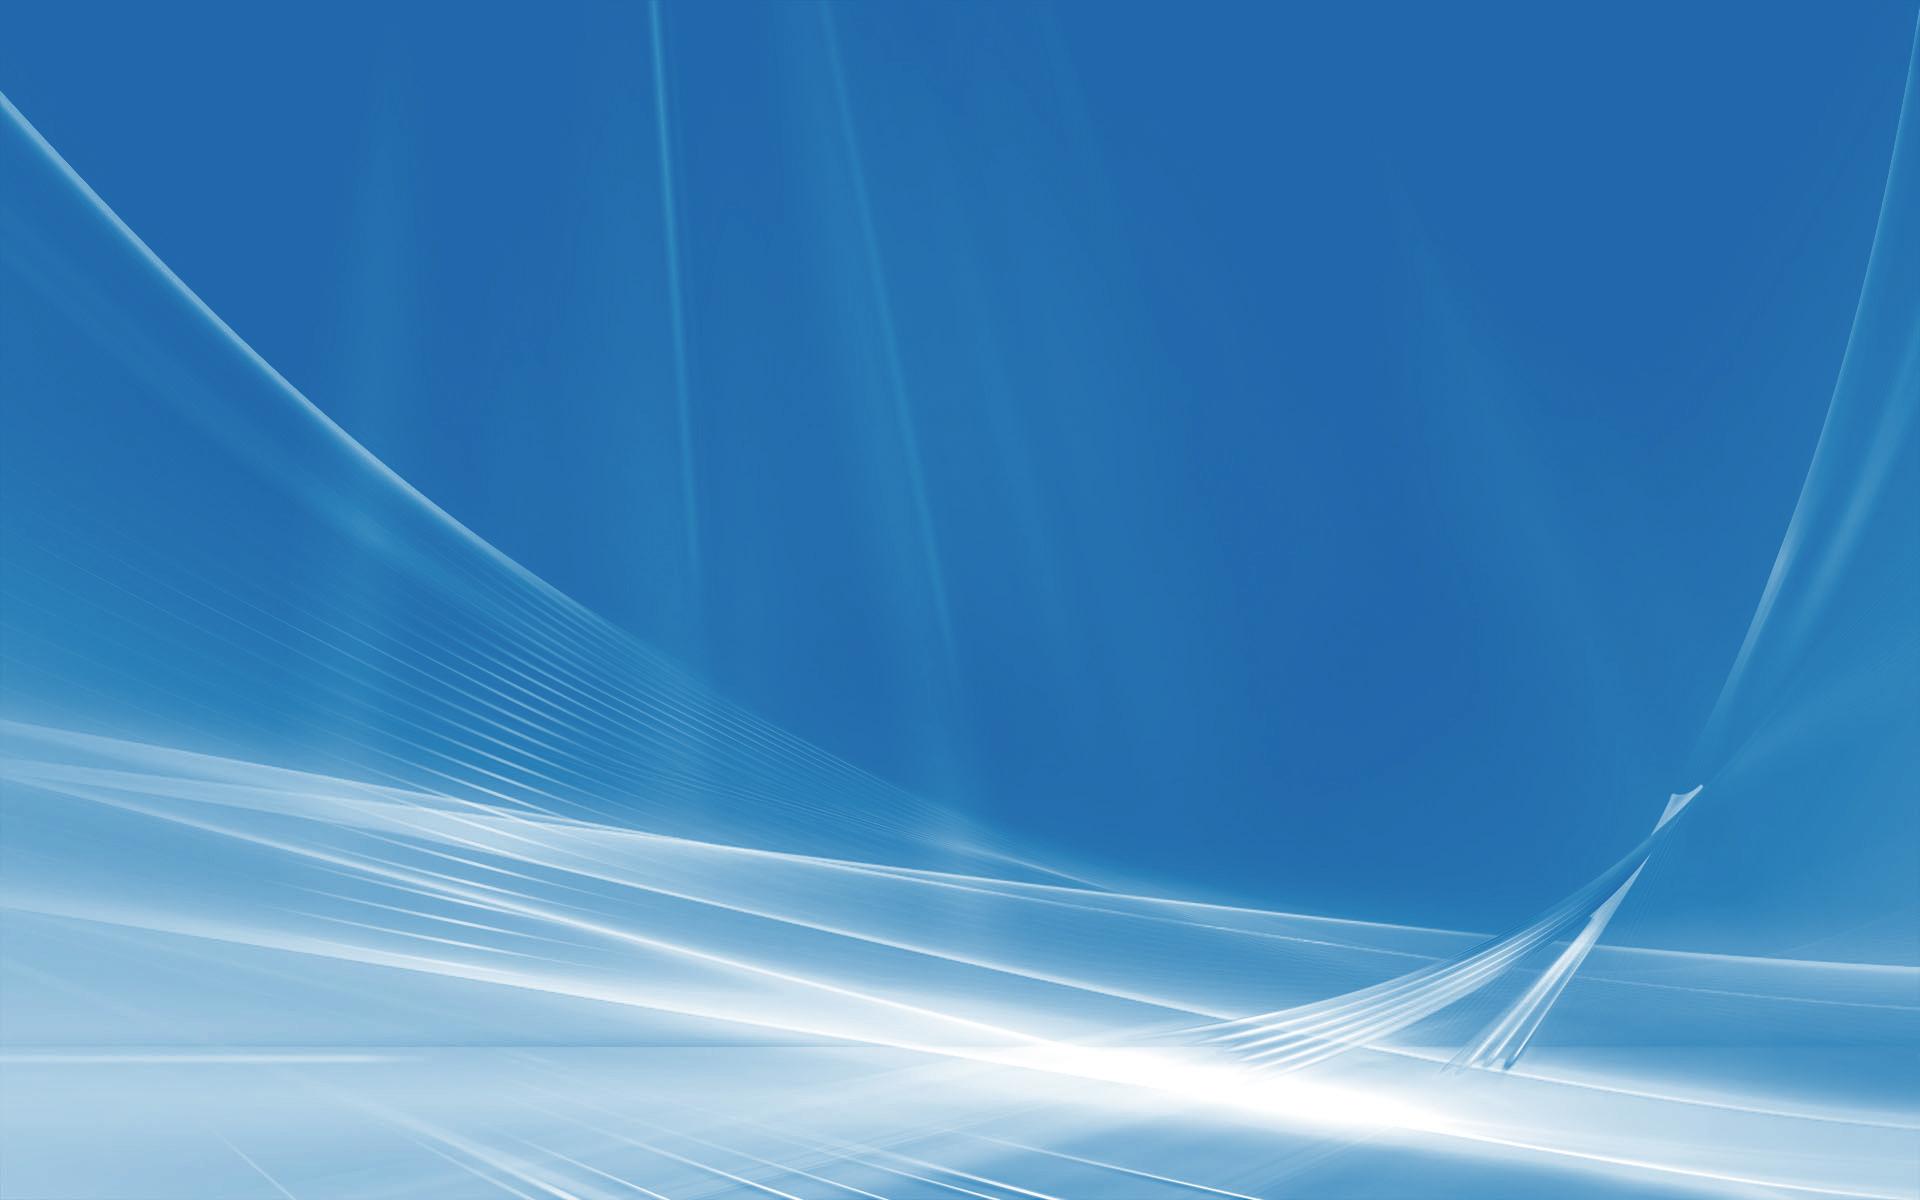 High Resolution Wallpaper | Blue White 1920x1200 px